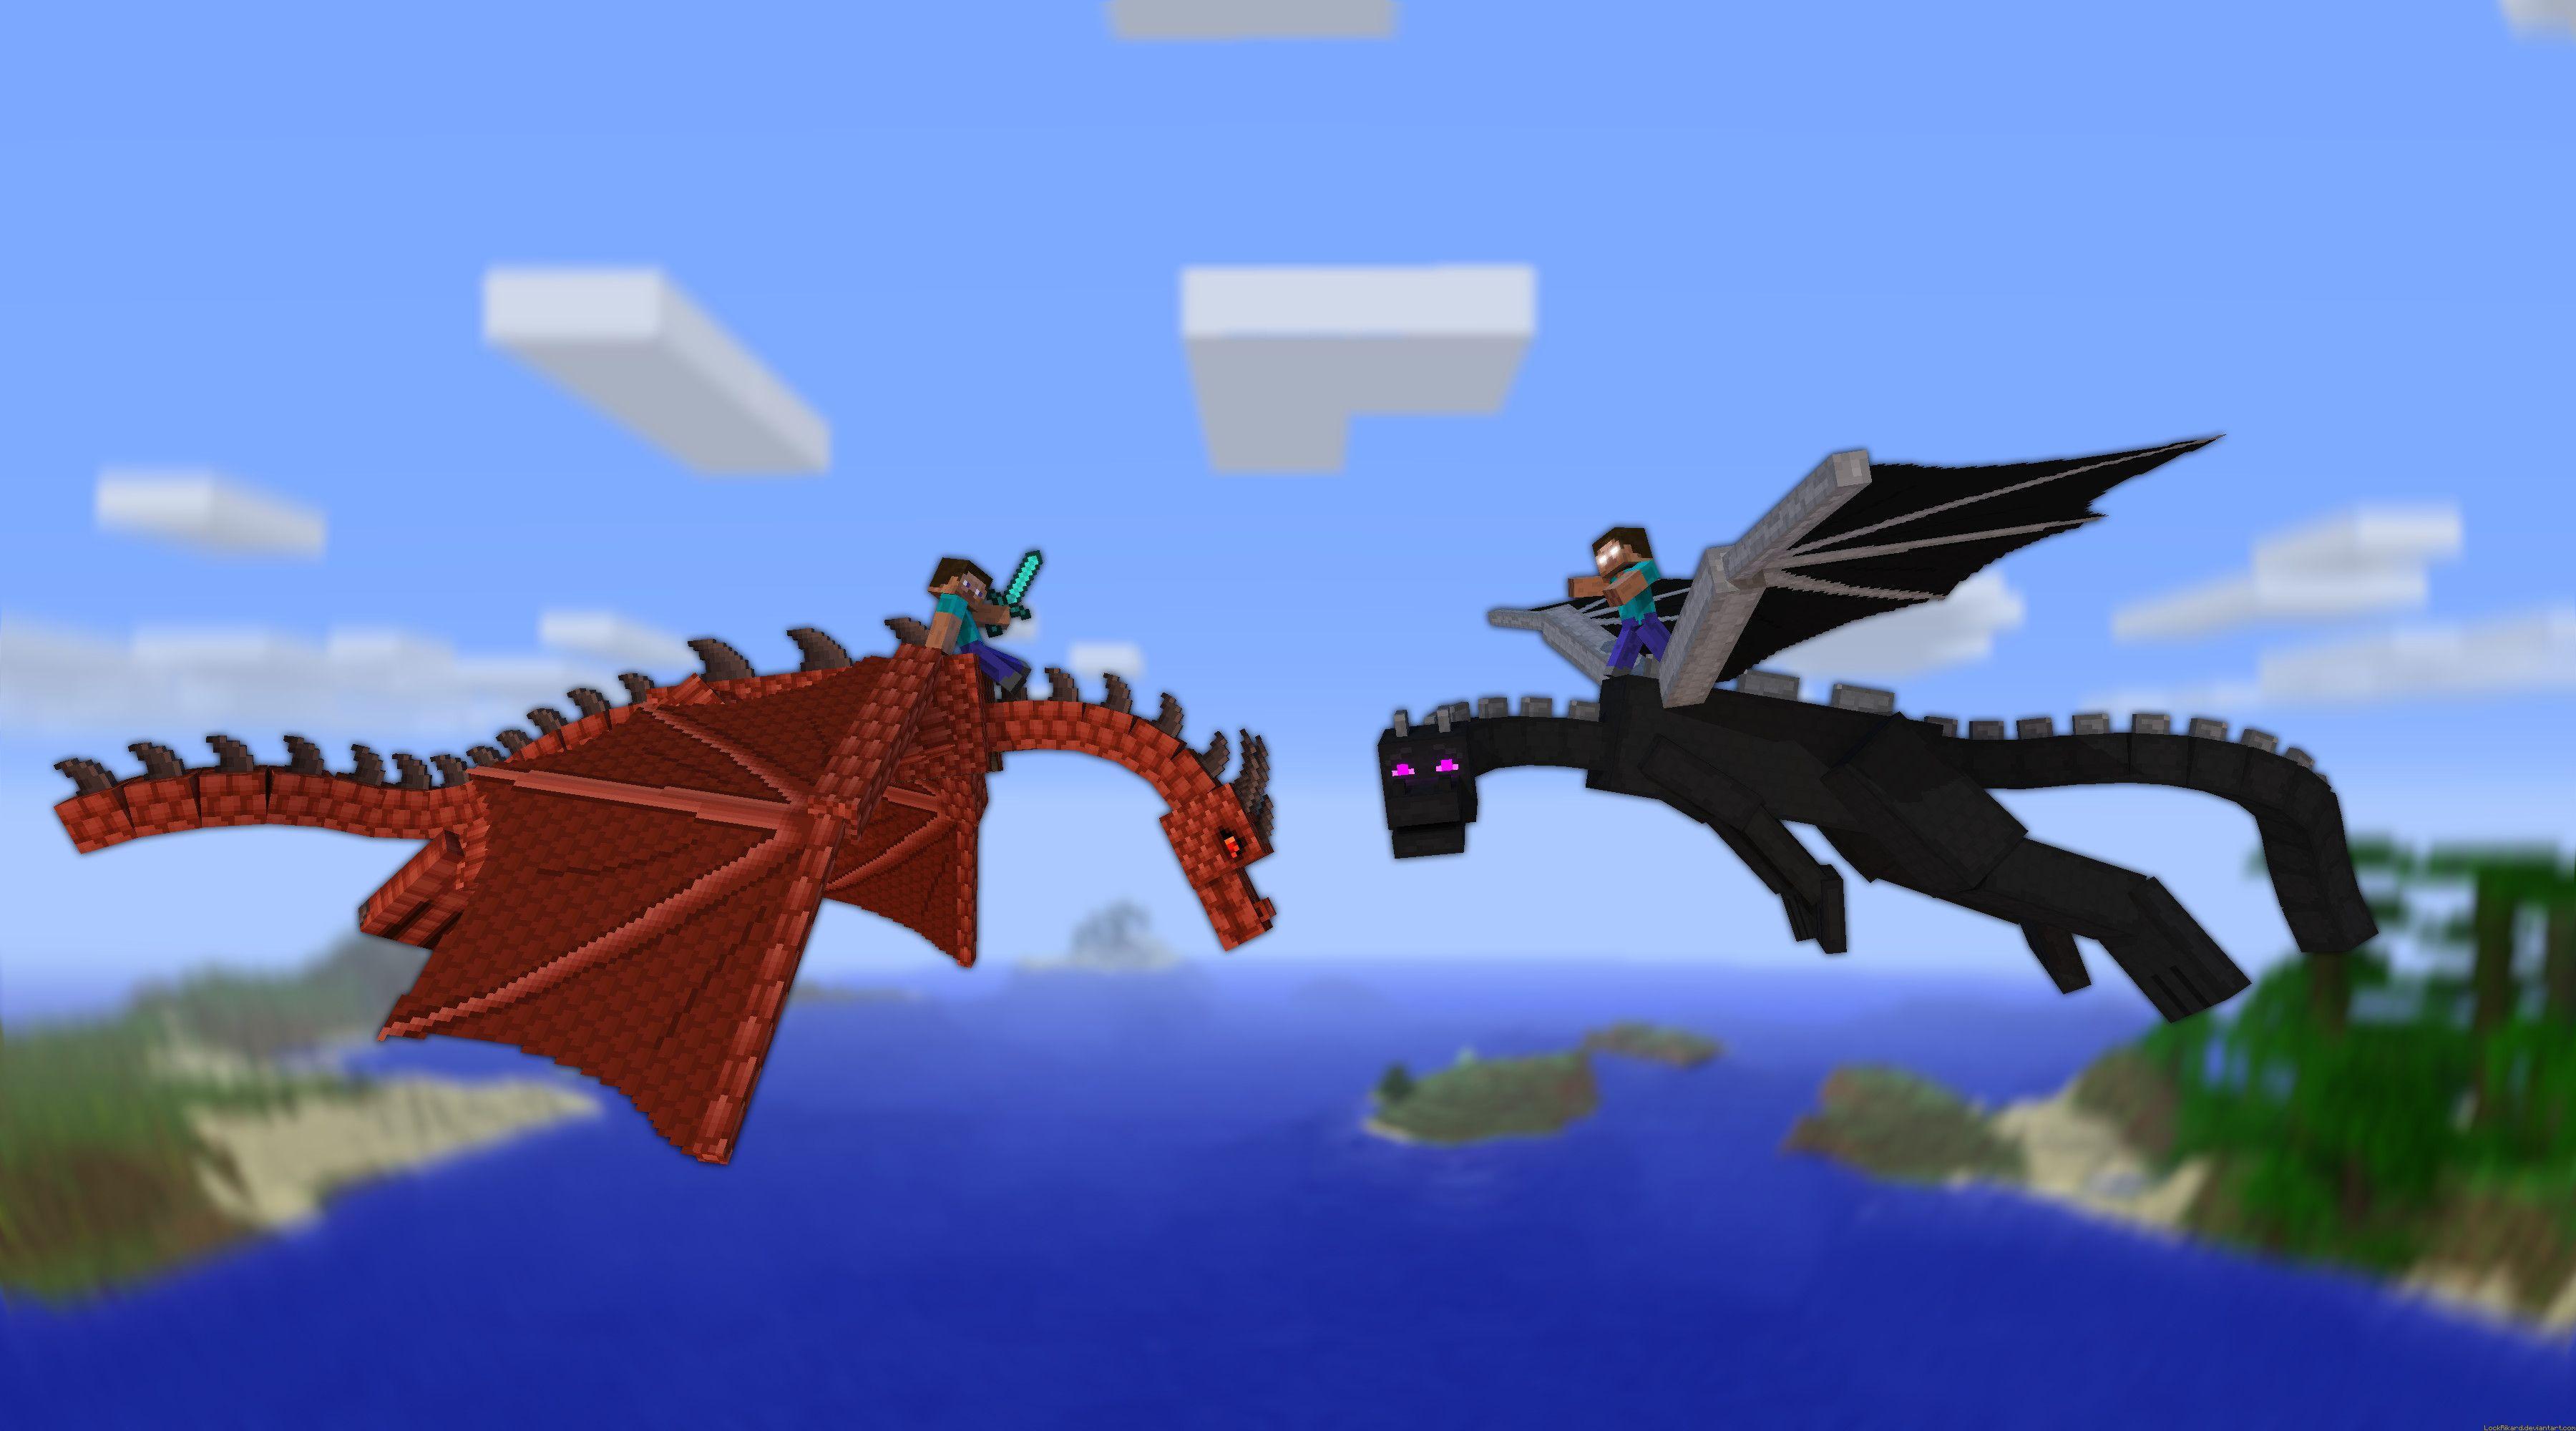 Minecraft Herobrine Wallpapers Top Free Minecraft Herobrine Backgrounds Wallpaperaccess